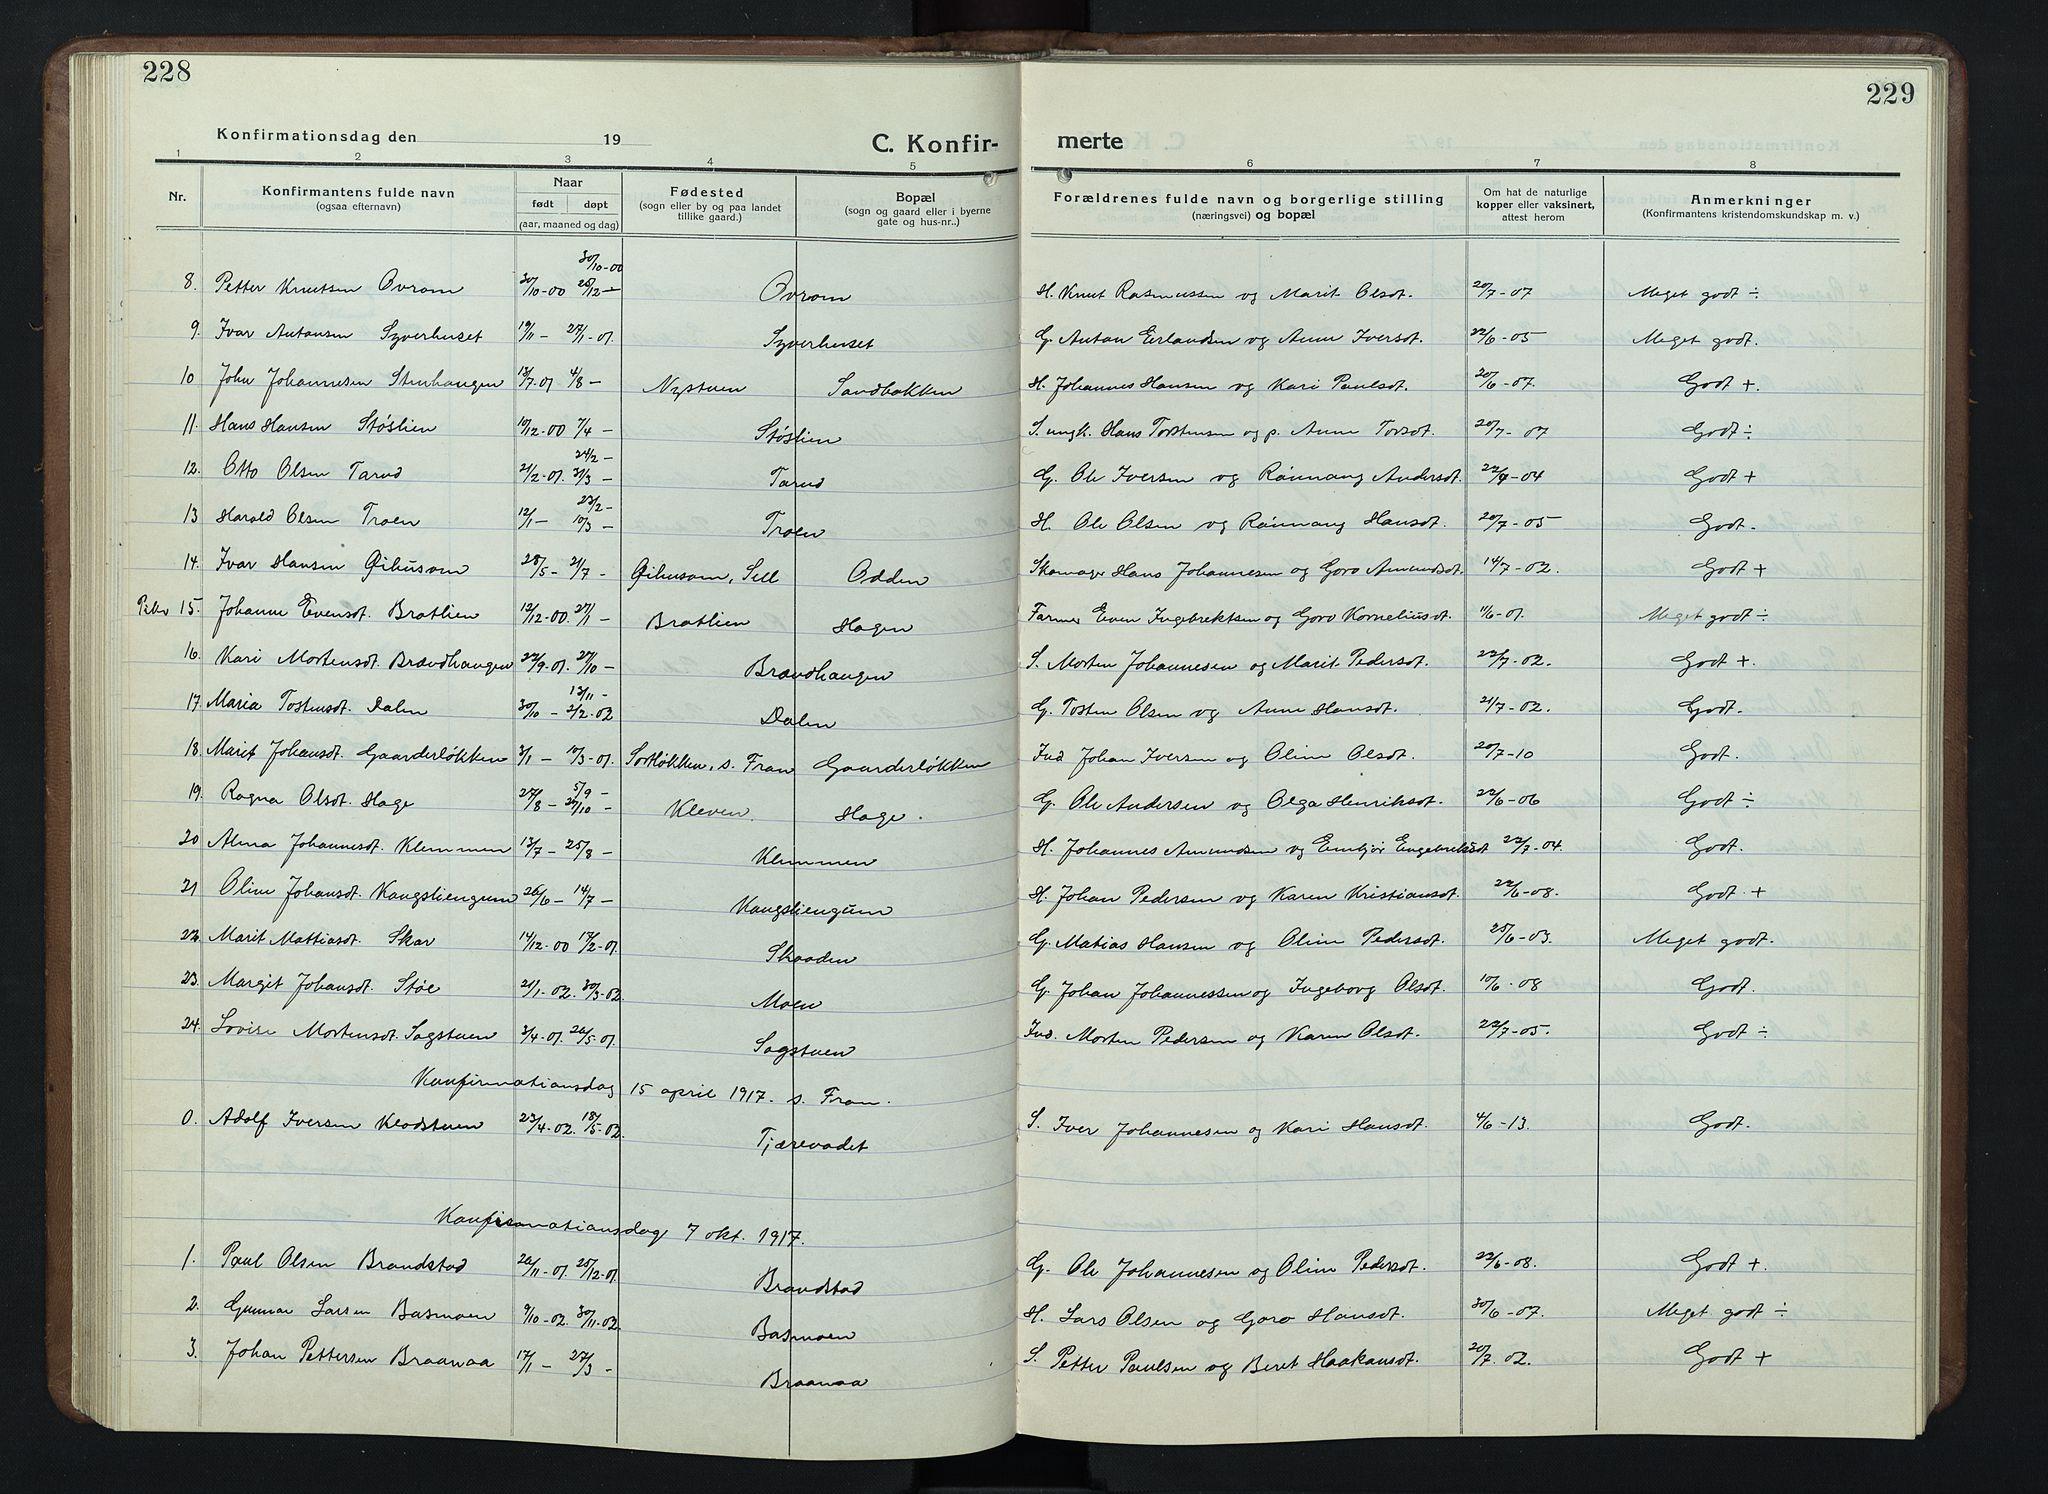 SAH, Nord-Fron prestekontor, Klokkerbok nr. 7, 1915-1946, s. 228-229